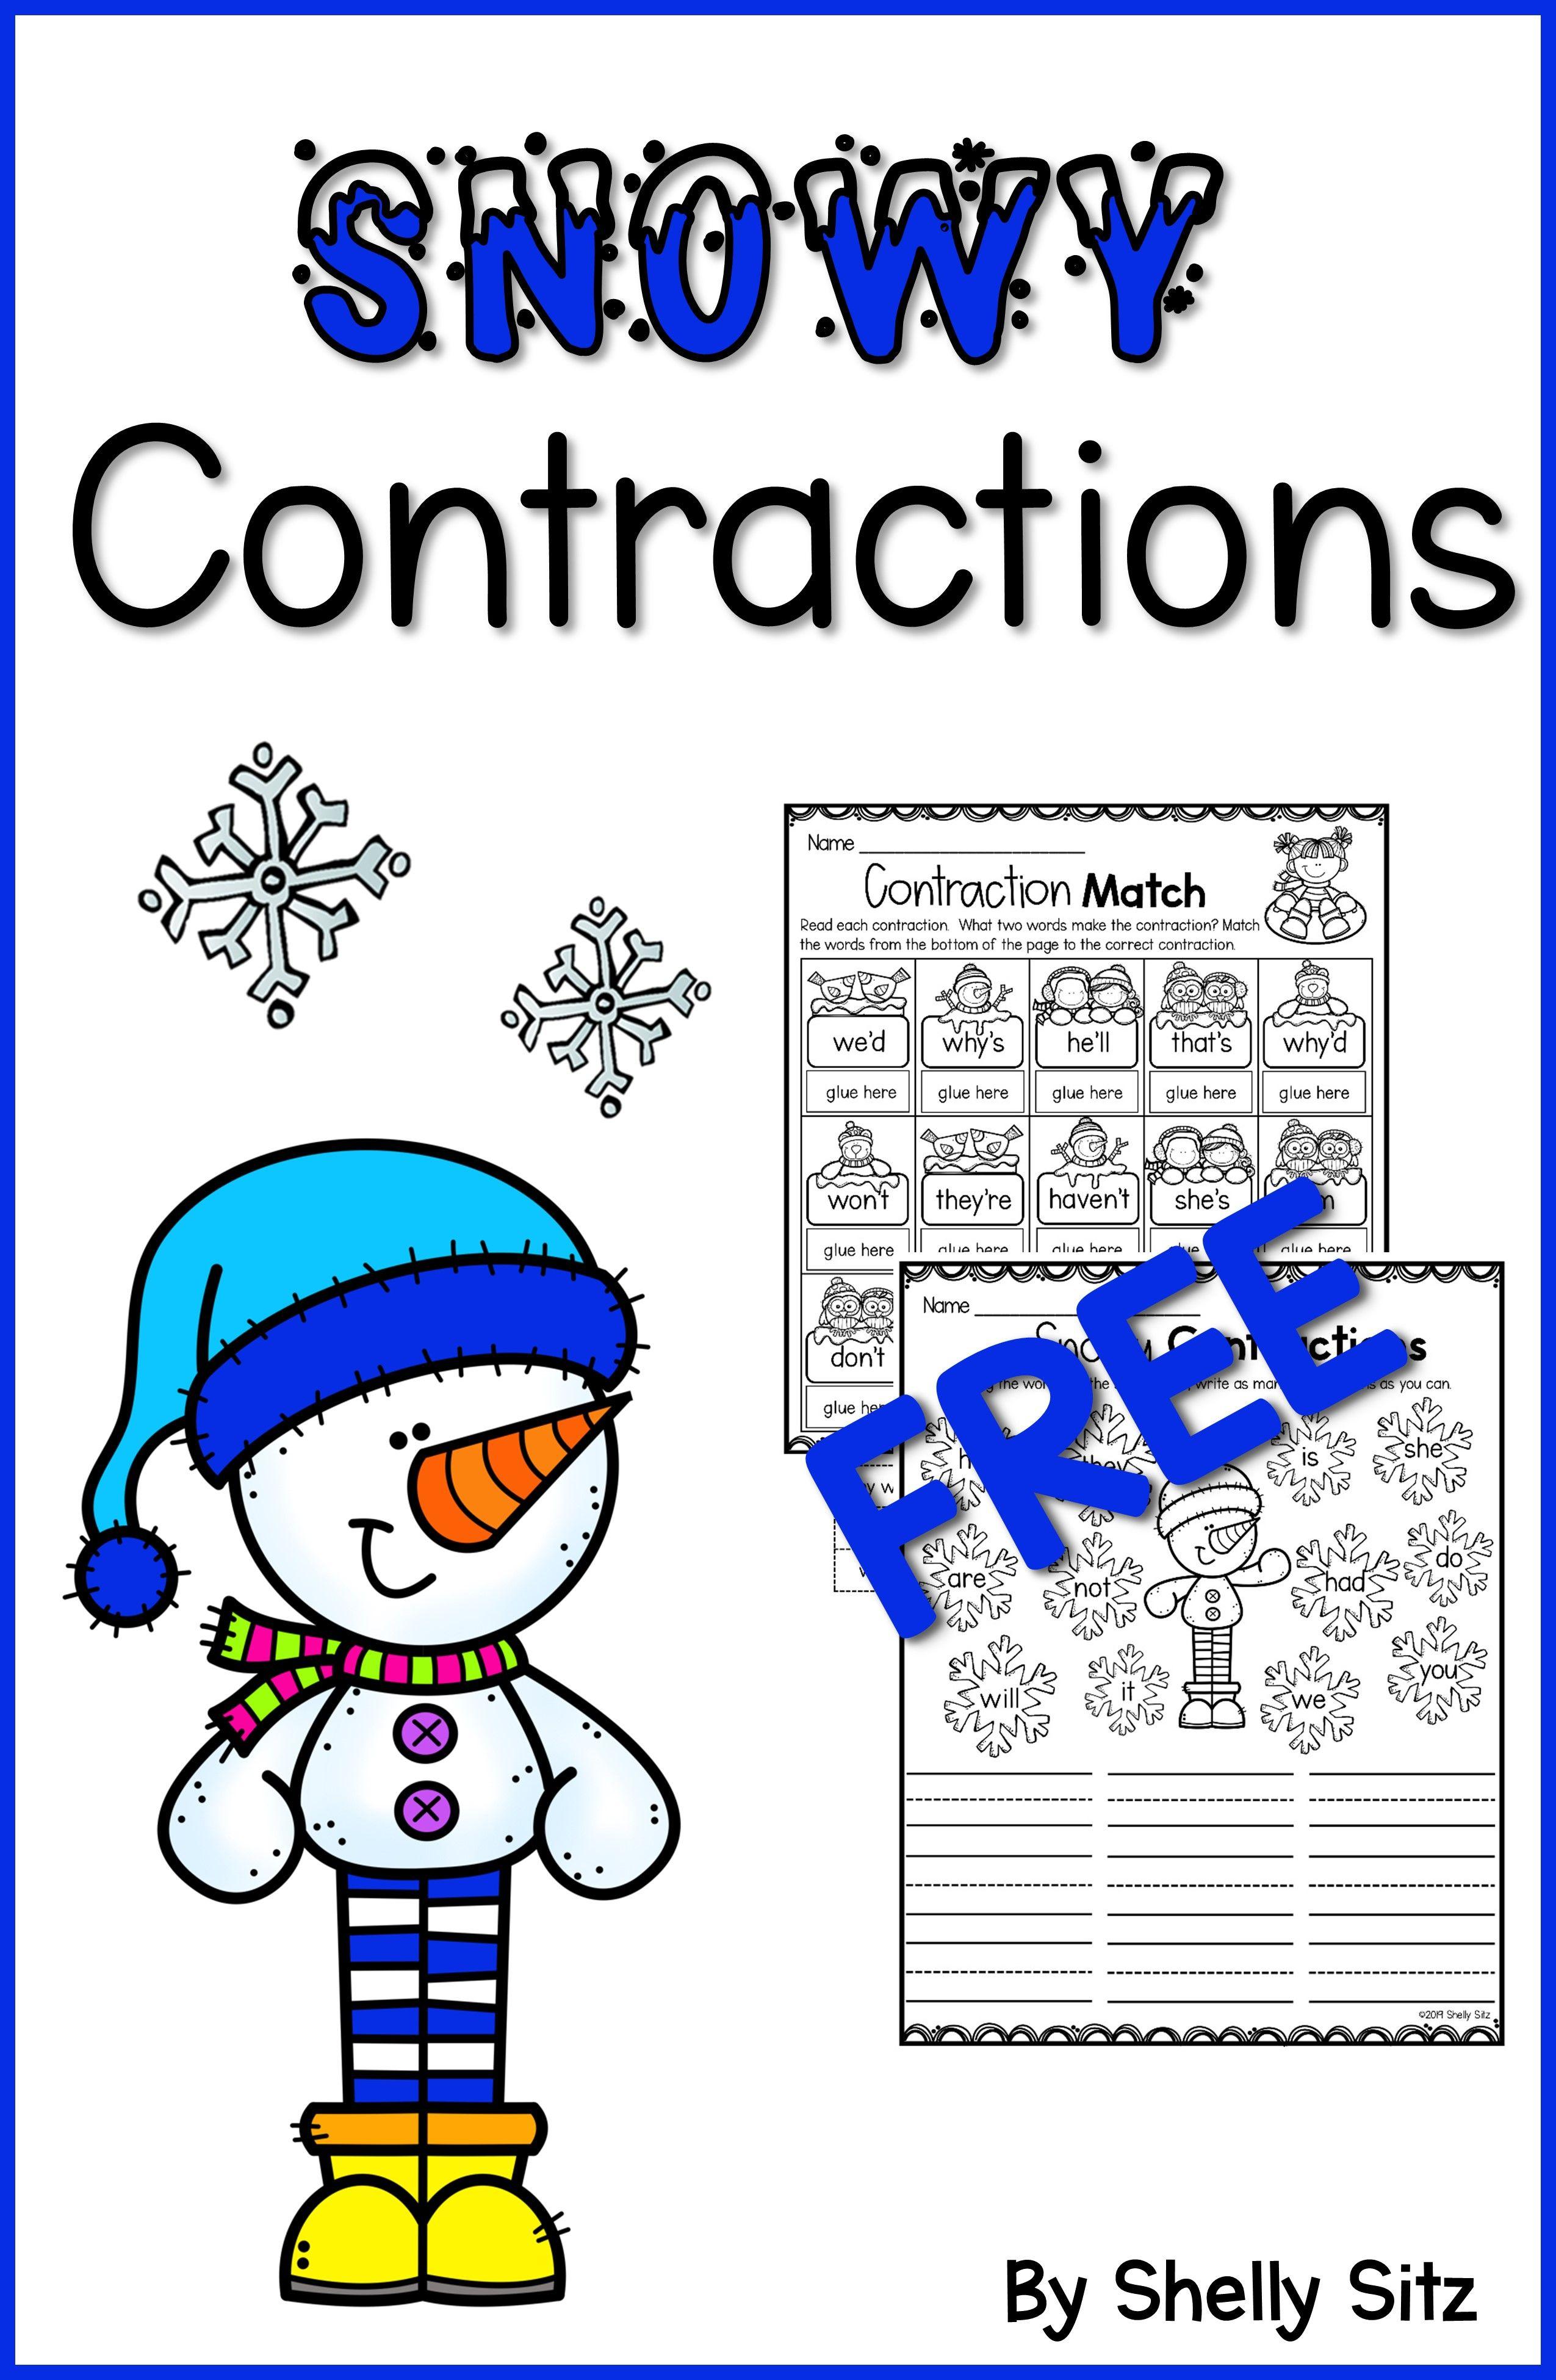 Contraction Worksheet   Contraction worksheet [ 3900 x 2550 Pixel ]